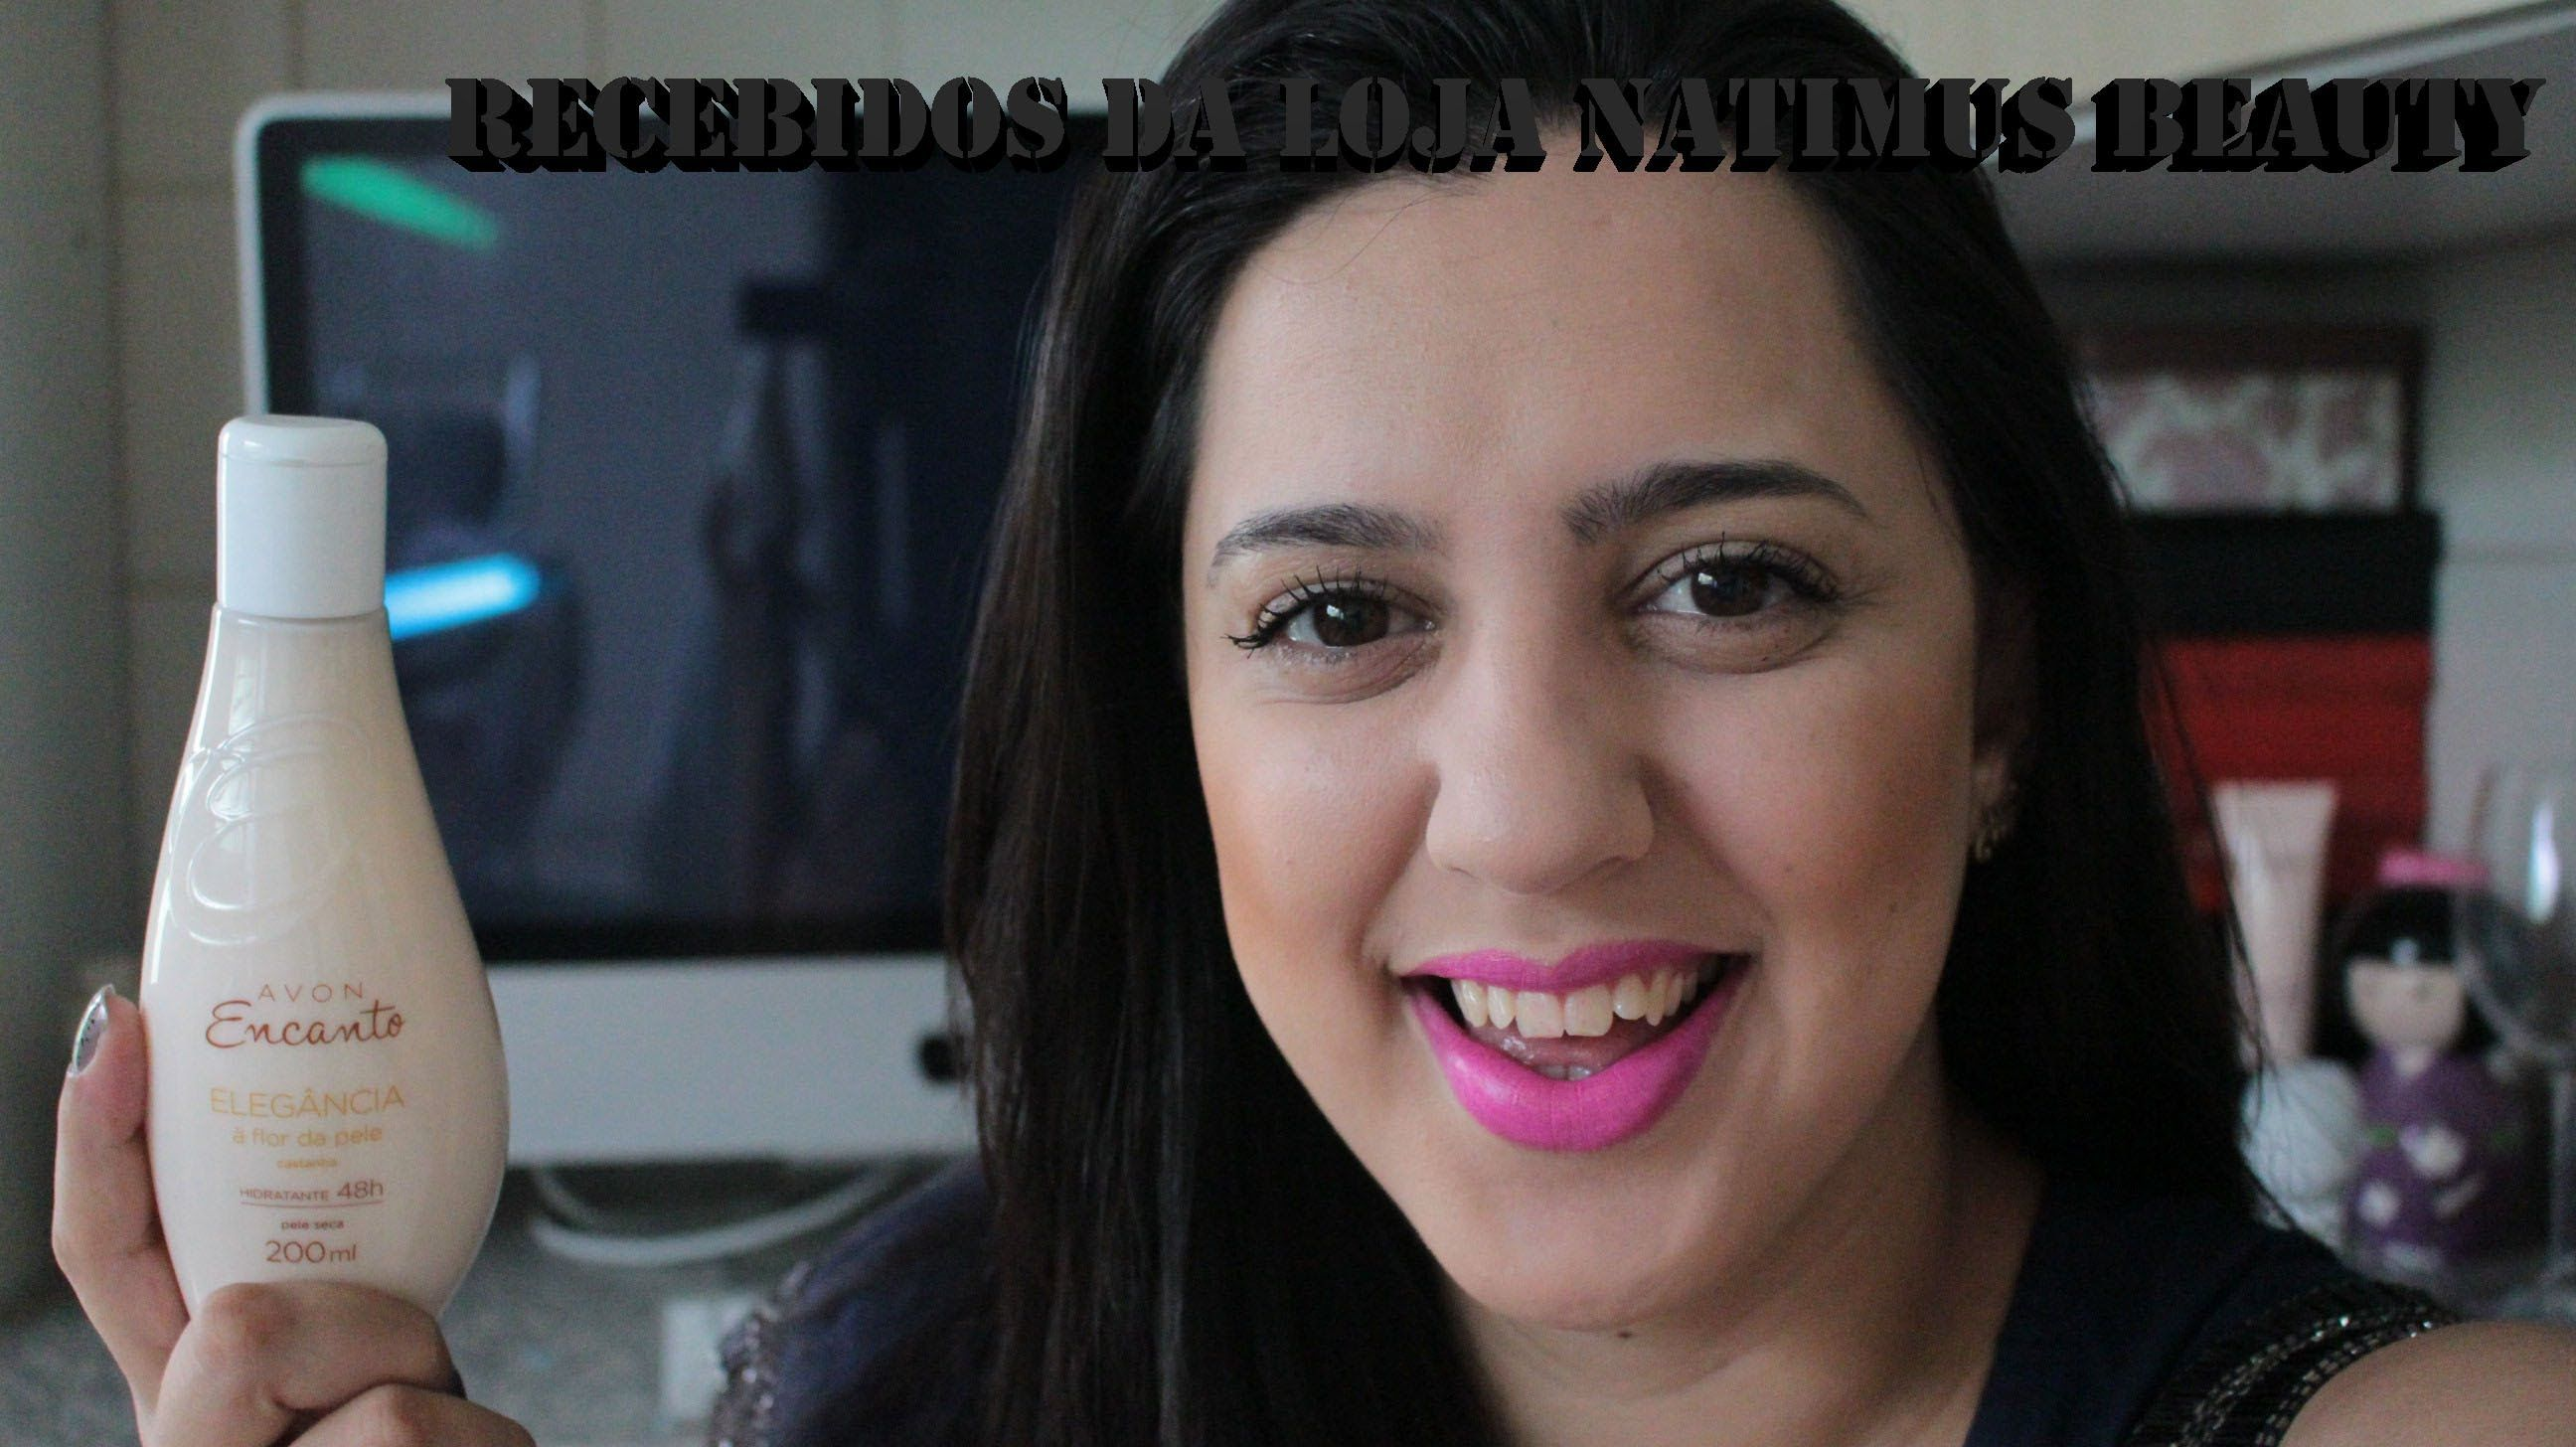 Recebidos da loja Natimus Beauty do Blog Nada Perfeita